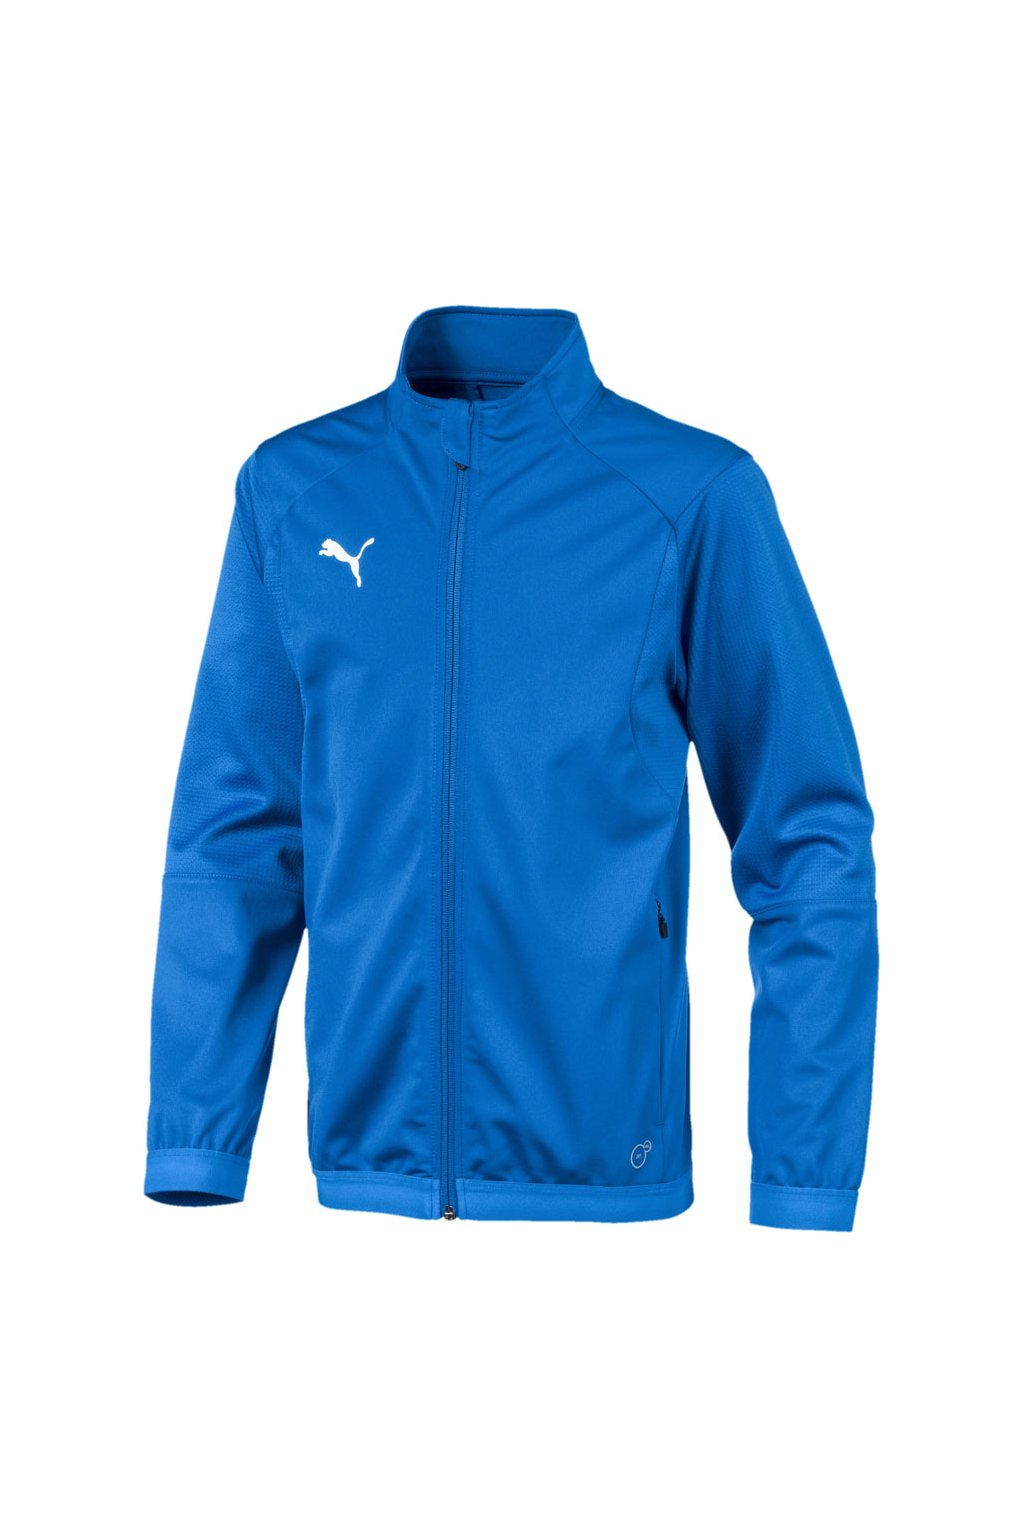 Detská mikina Puma Liga Training Jacket JUNIOR modrá 655688 02